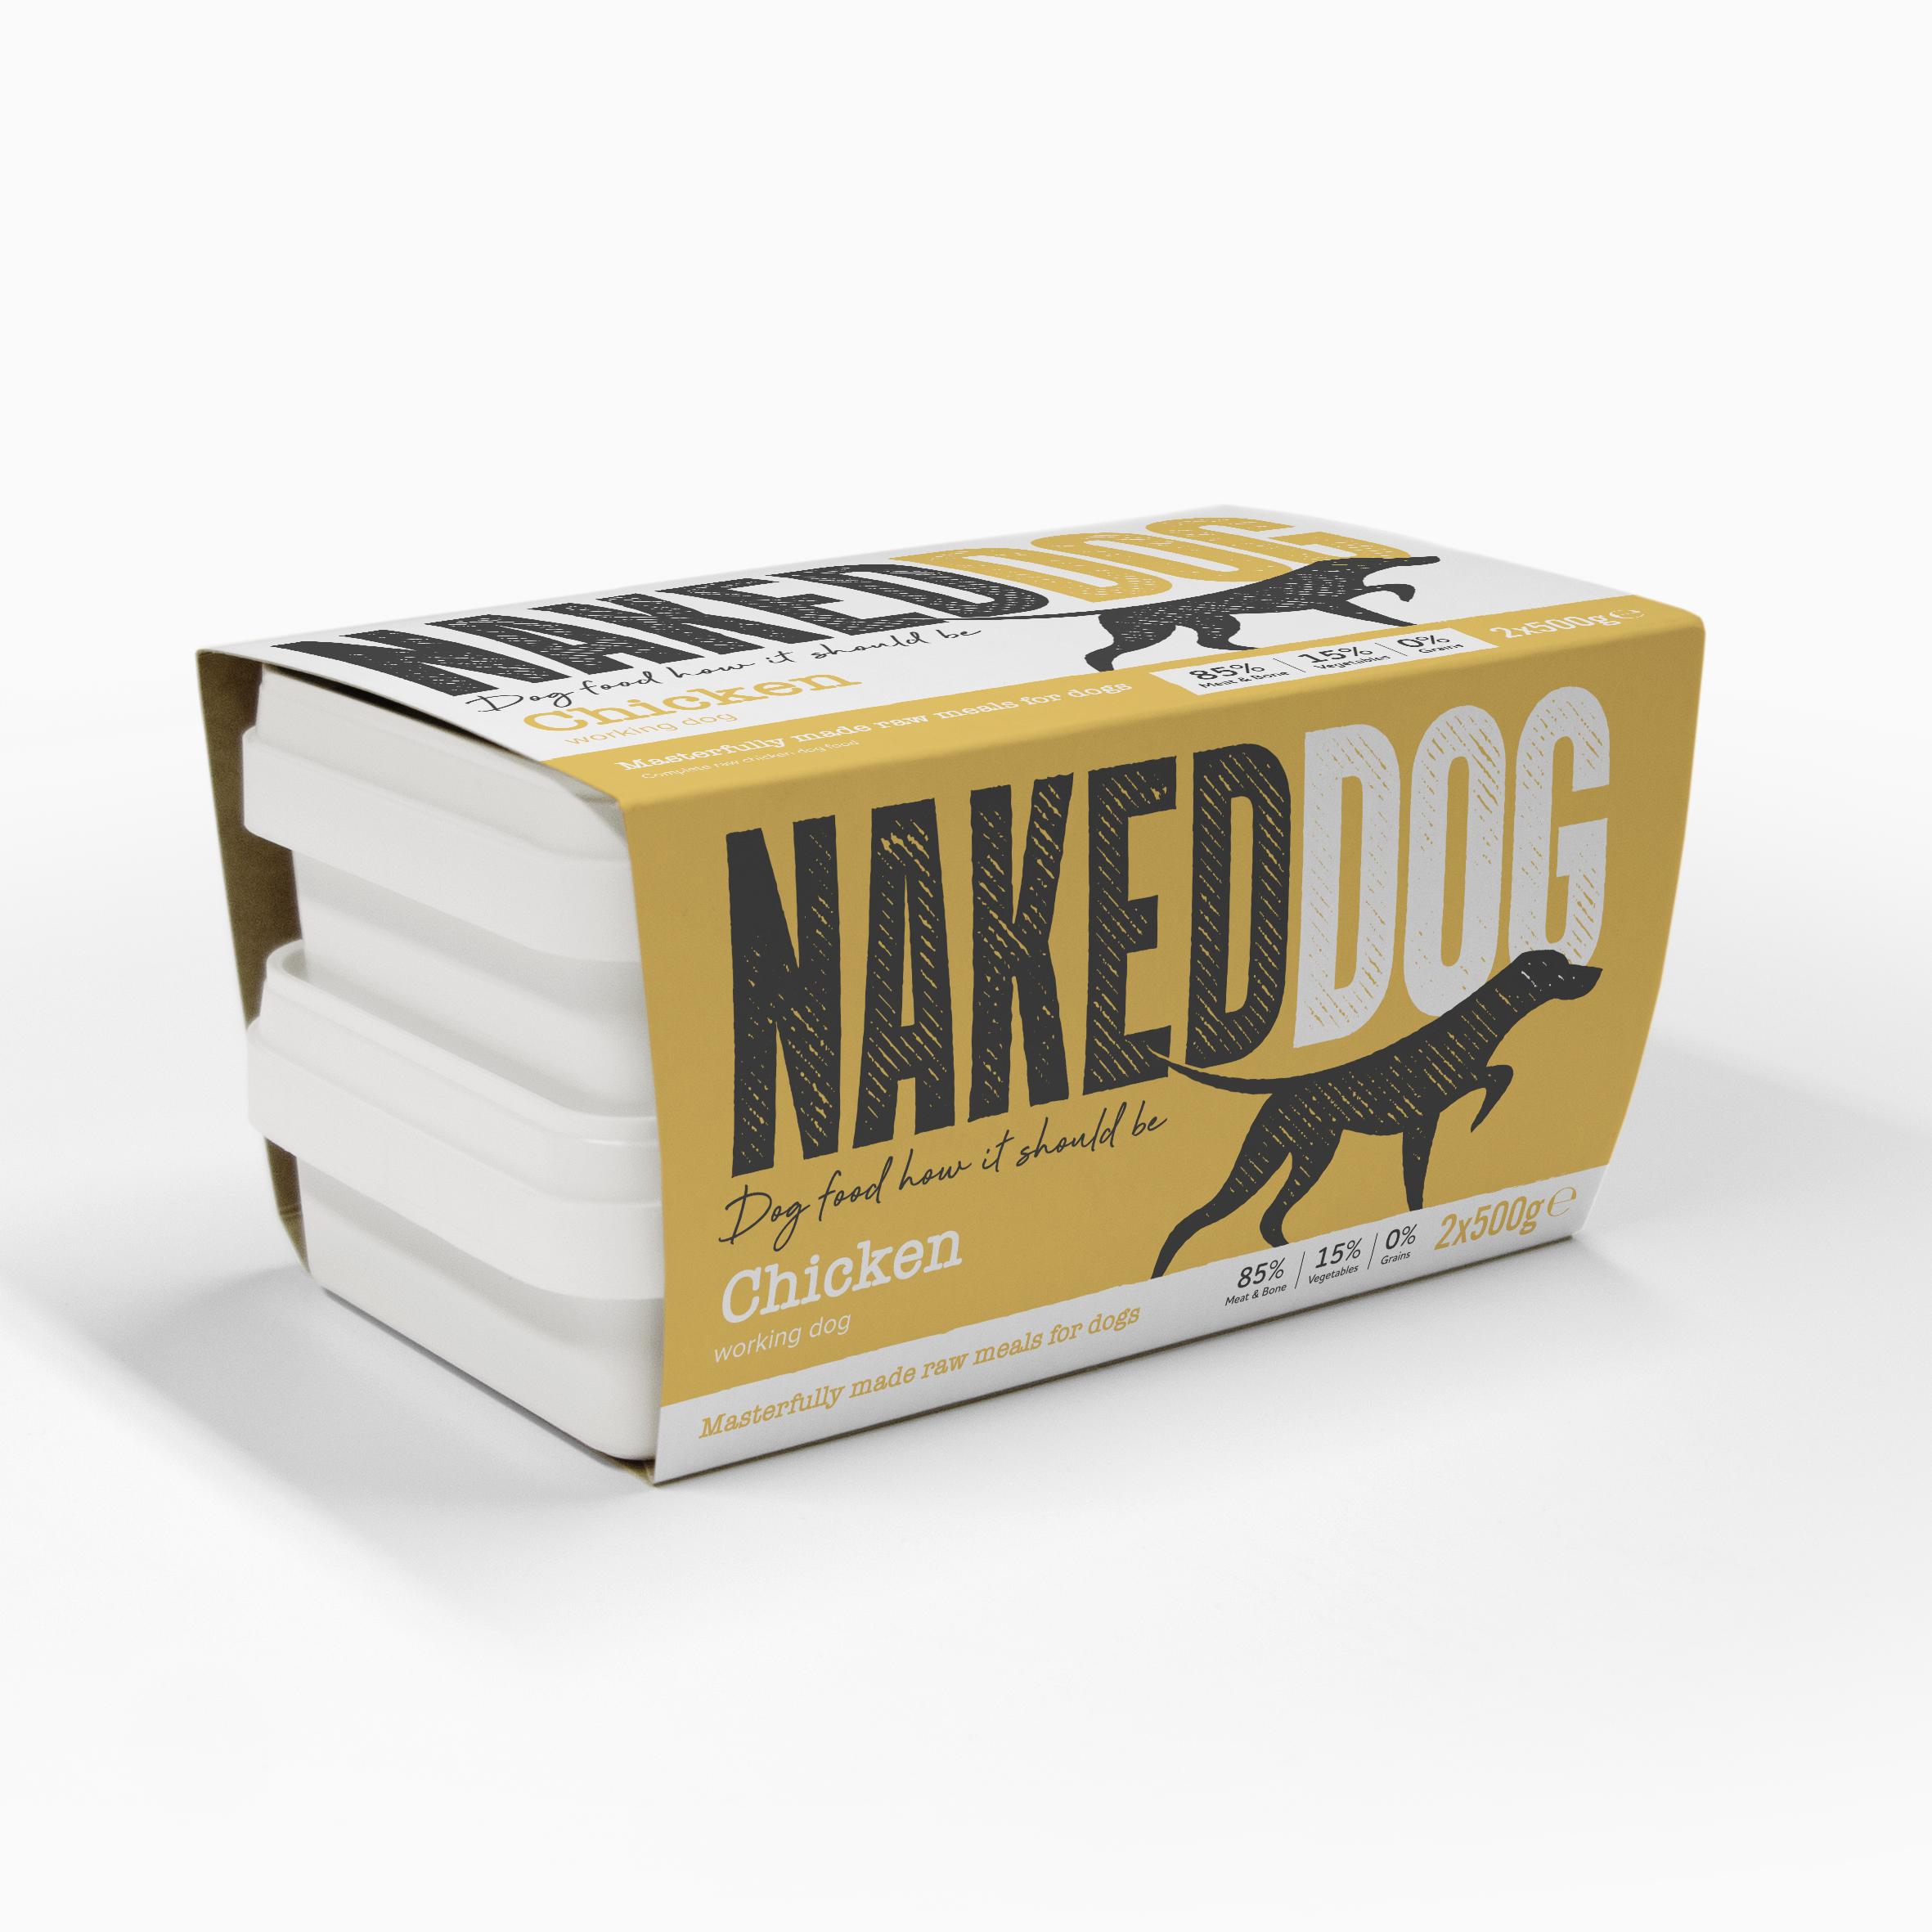 Naked Dog_product image-2x500g pack_Chic